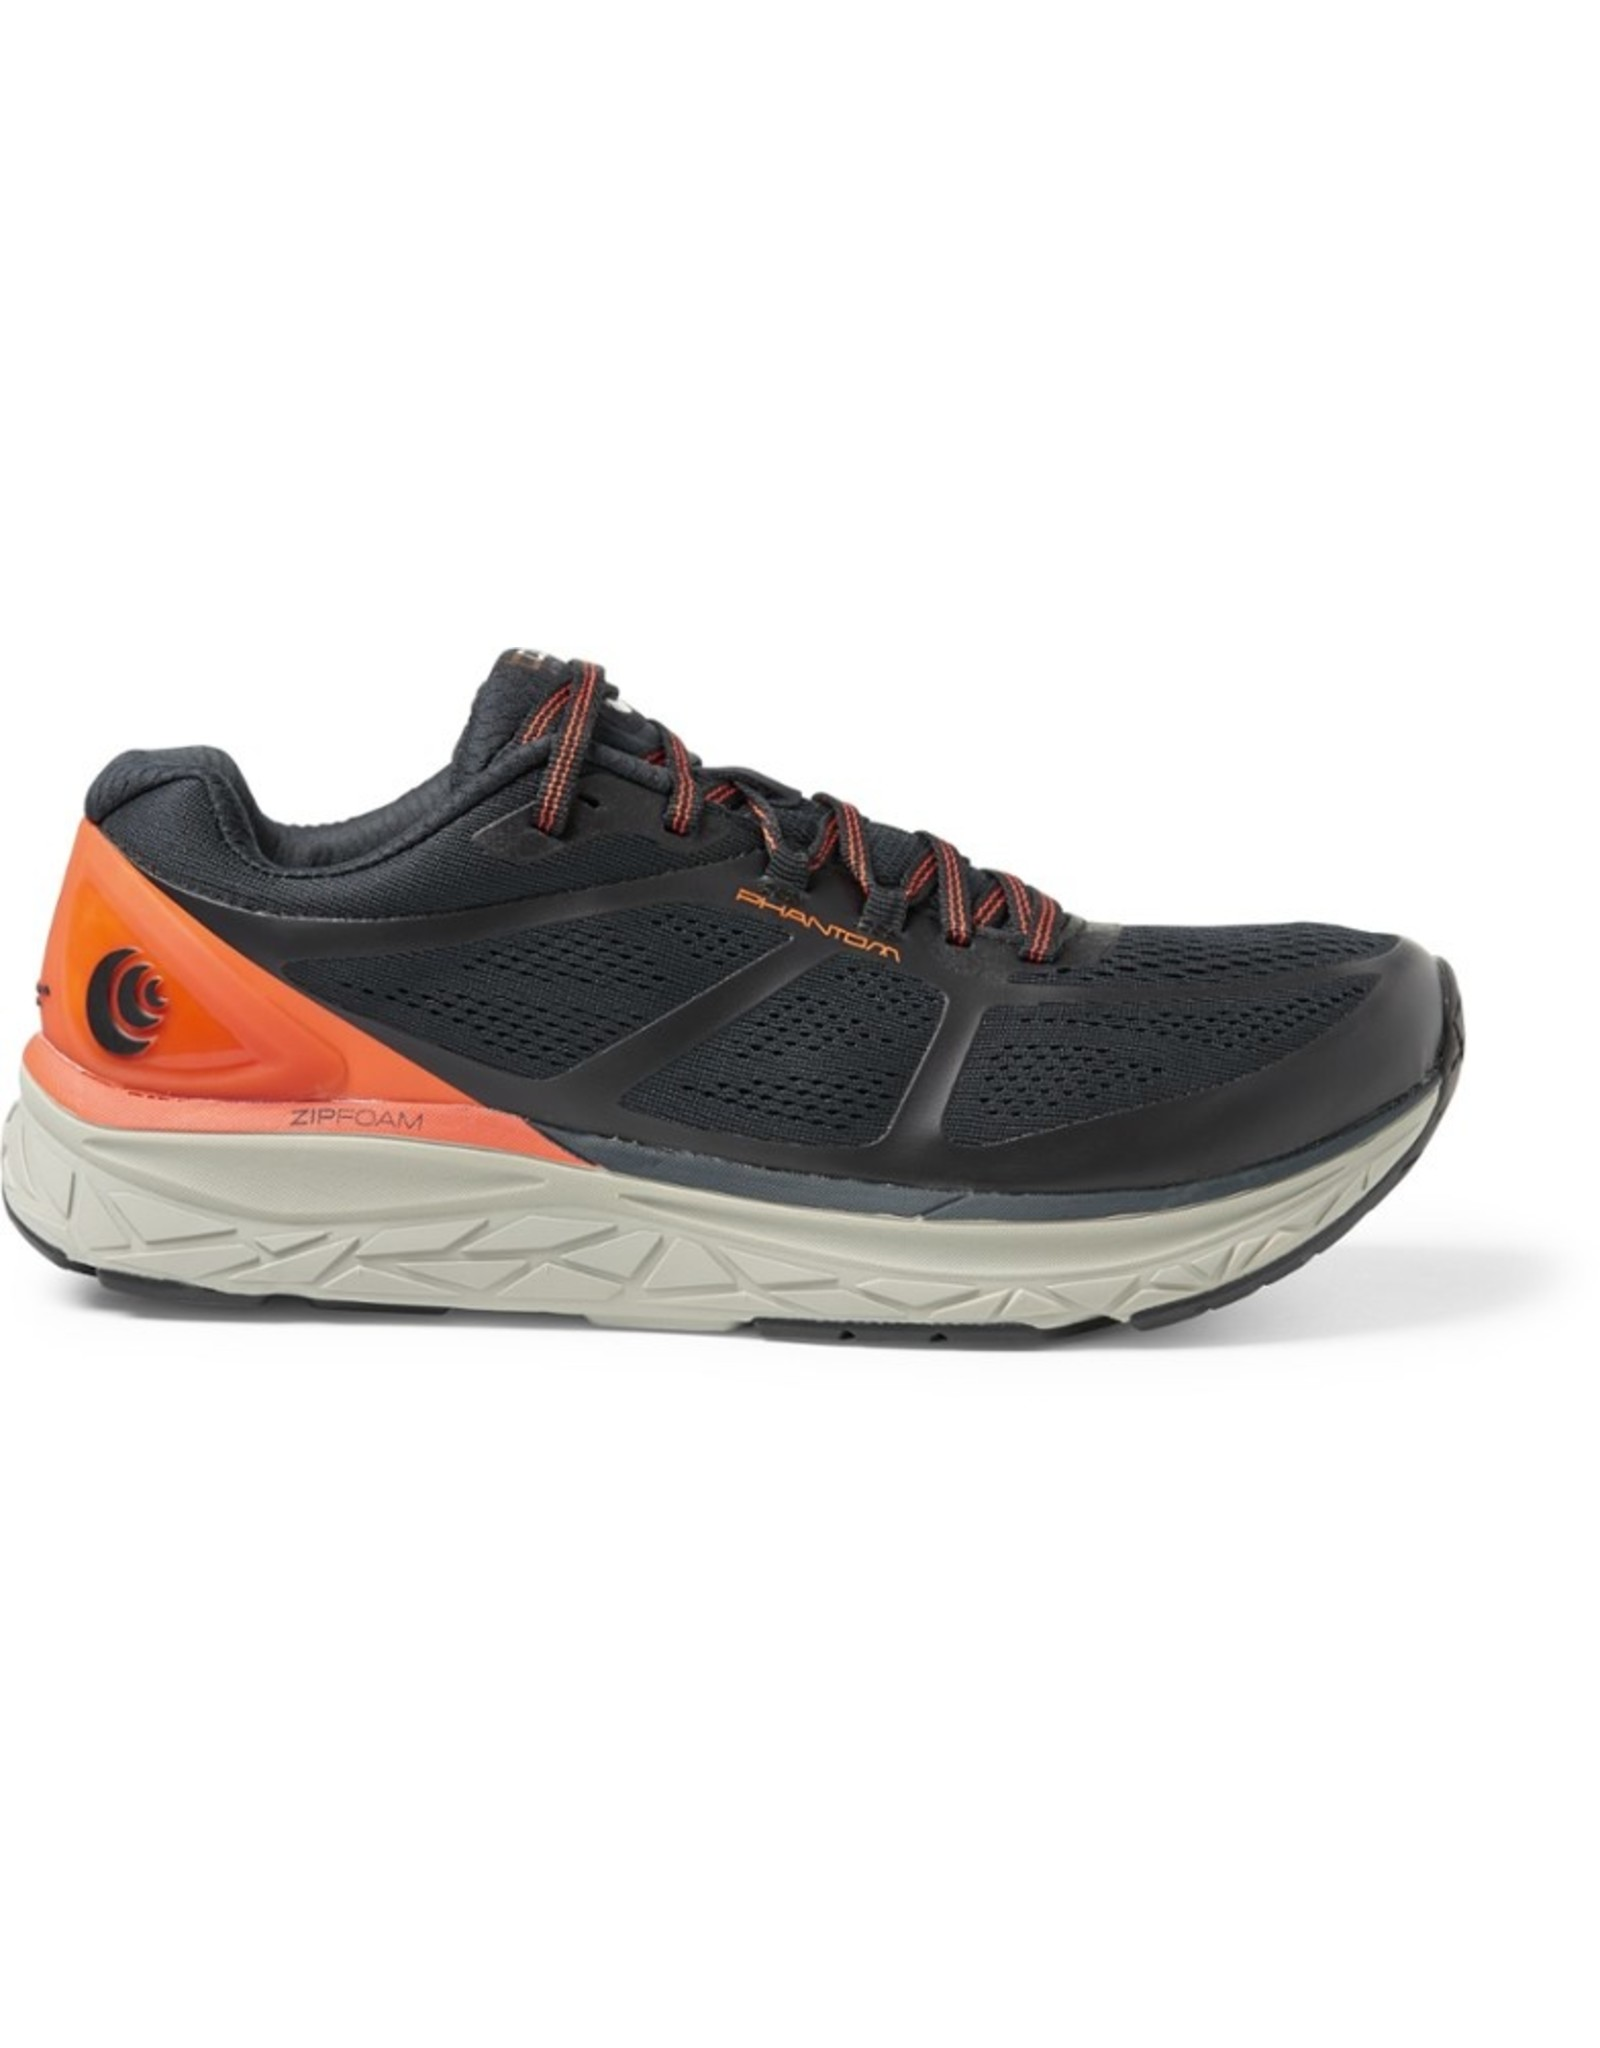 Topo Topo Athletic Phantom Men's Road Running Shoe Navy/Orange Size 10